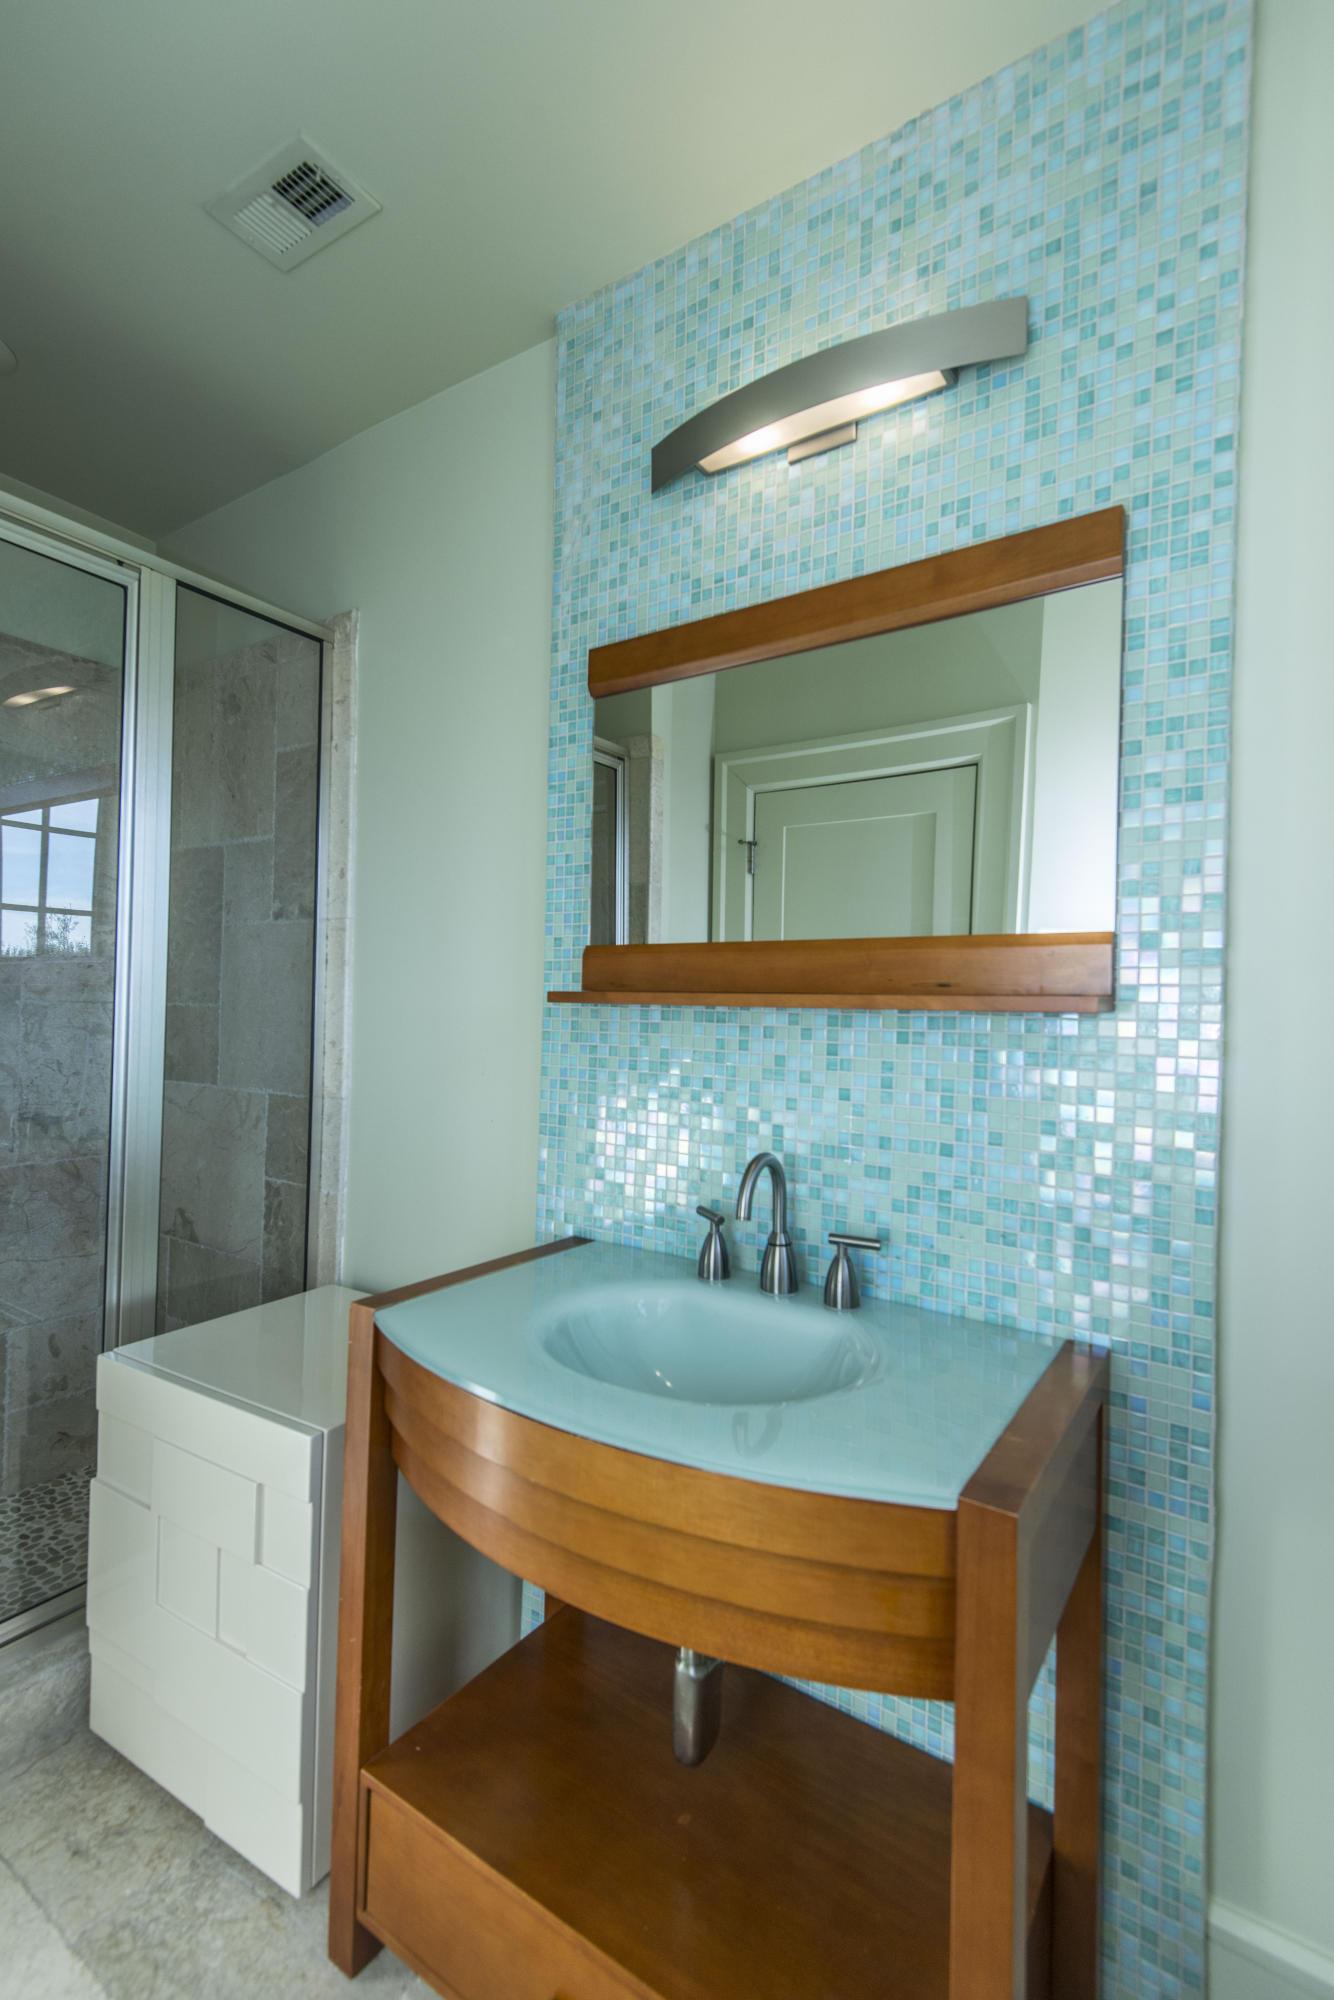 Saltgrass Pointe Homes For Sale - 916 Mciver, Mount Pleasant, SC - 39